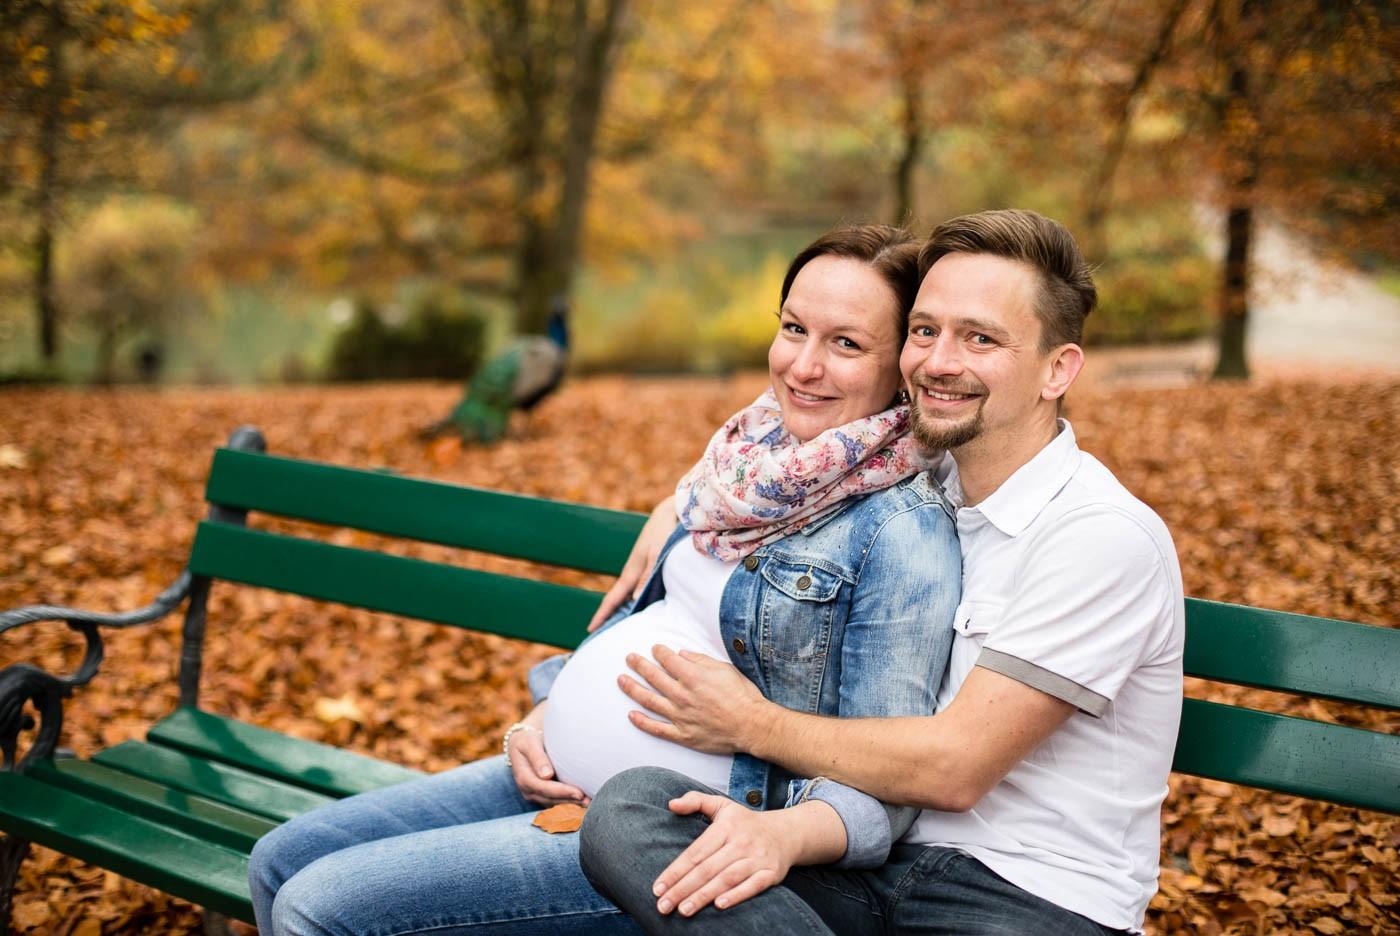 babybauchshooting-herbst-paarfotos-park-stimmungsbilder-schloss-ambras-fotografin-innsbruck-tirol